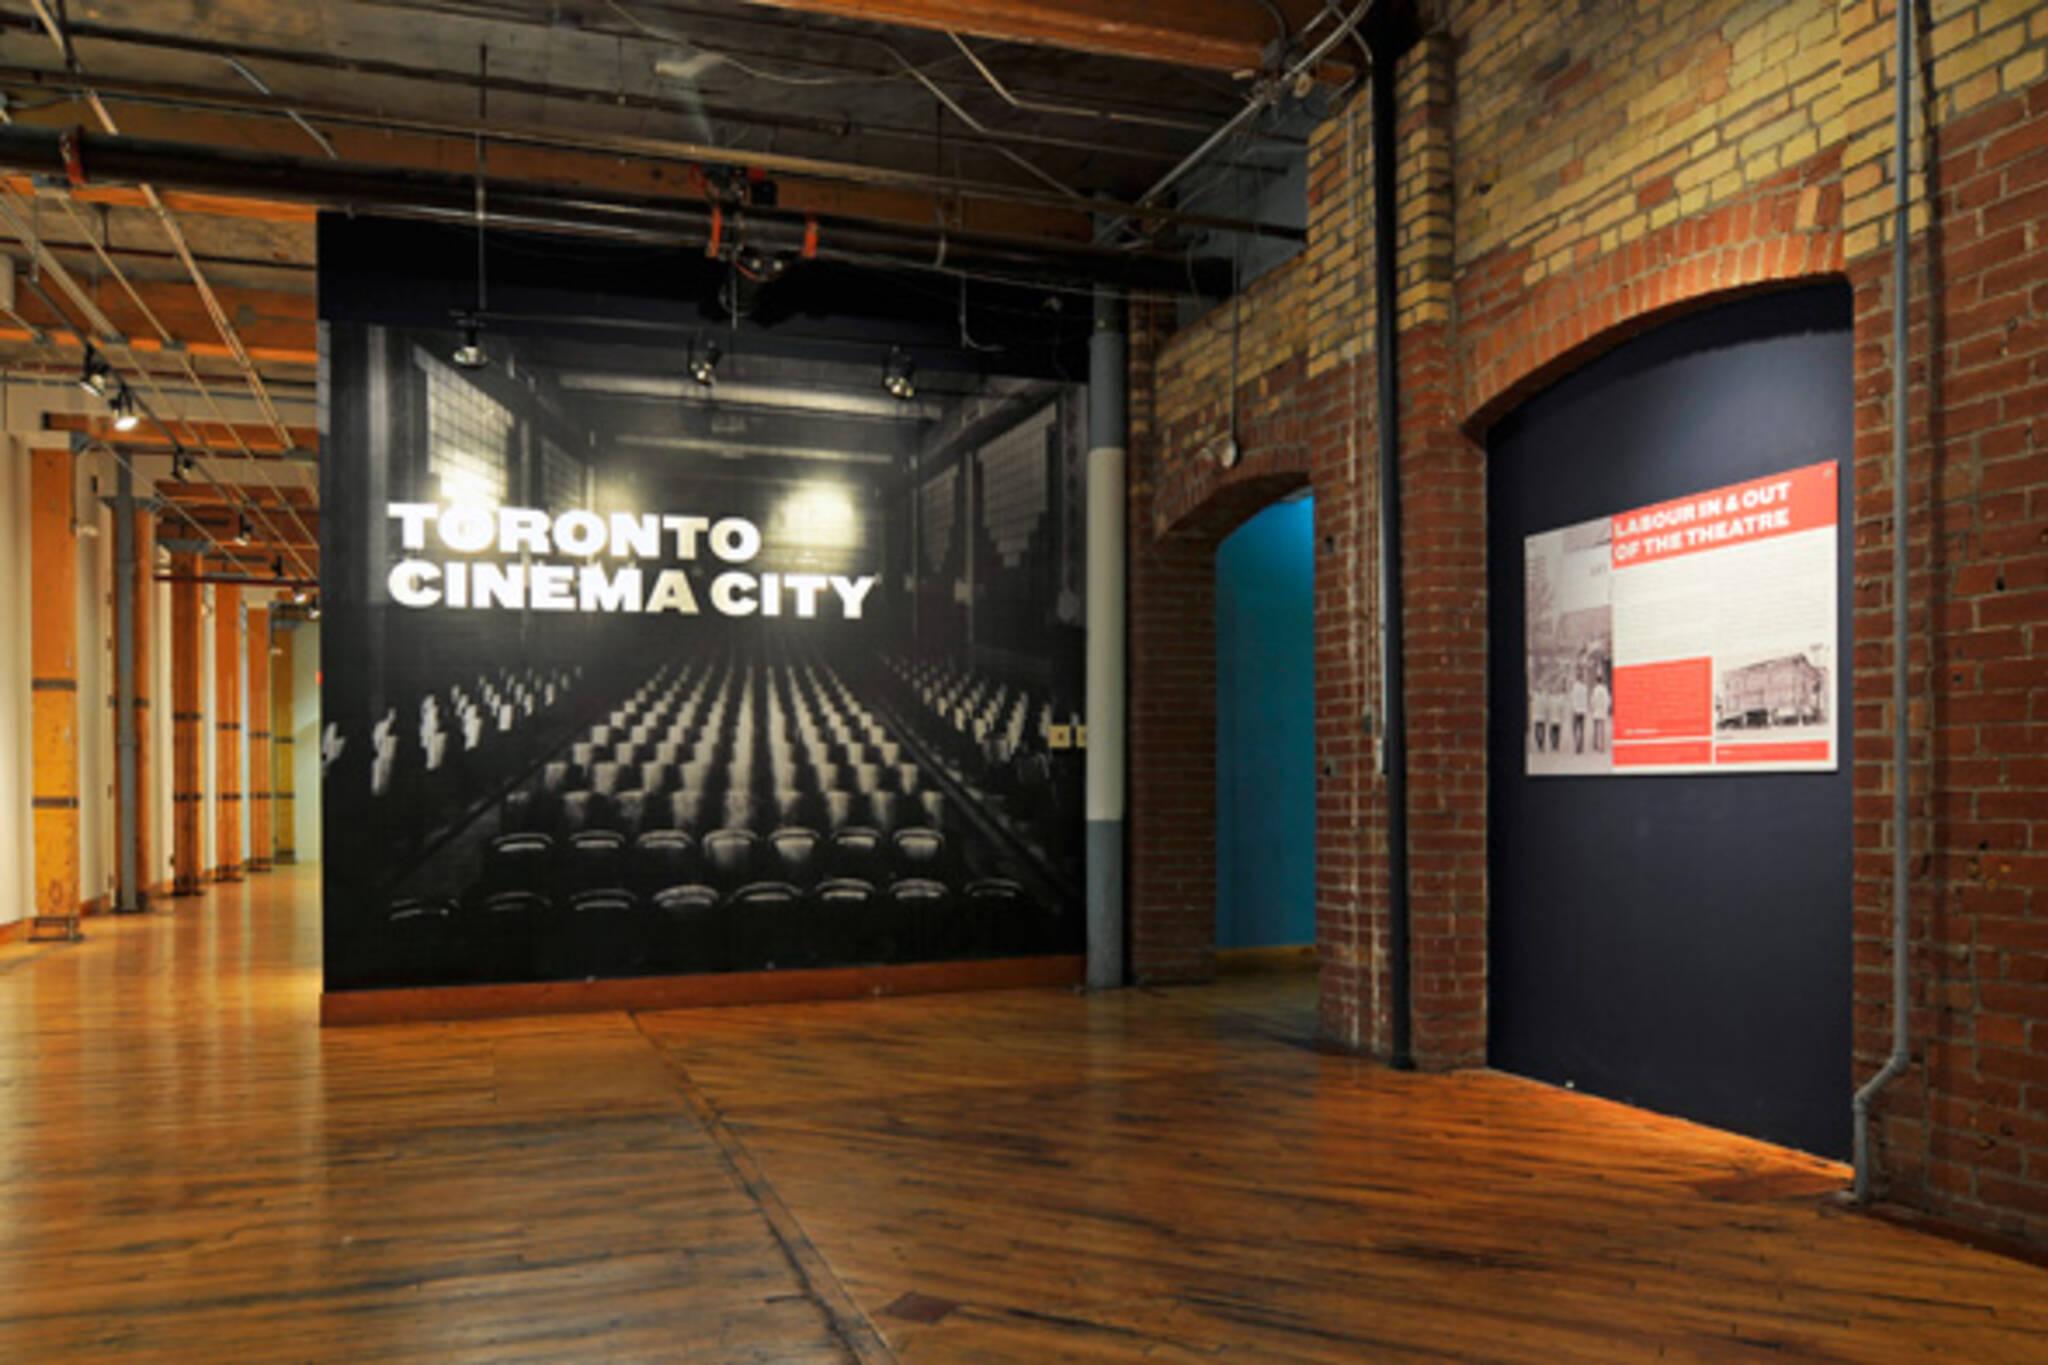 Toronto Cinema City